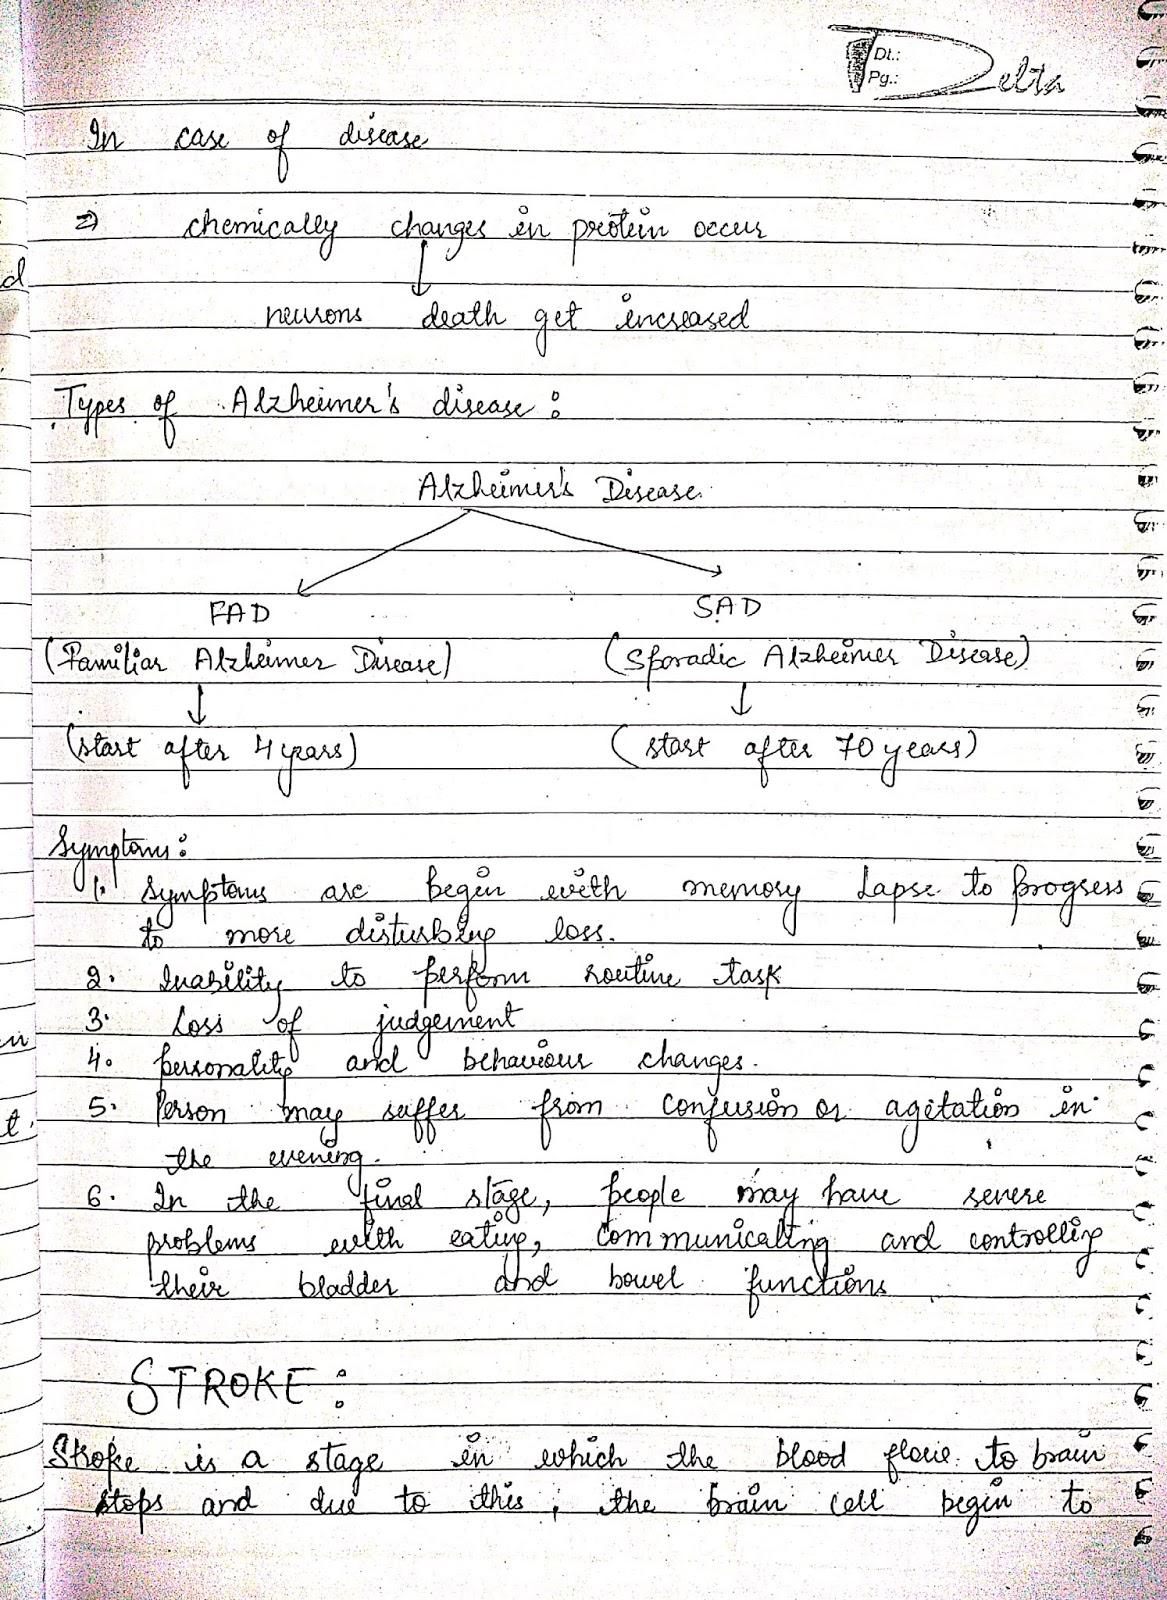 pathophysiology - nervous system disorder alziemer disorder